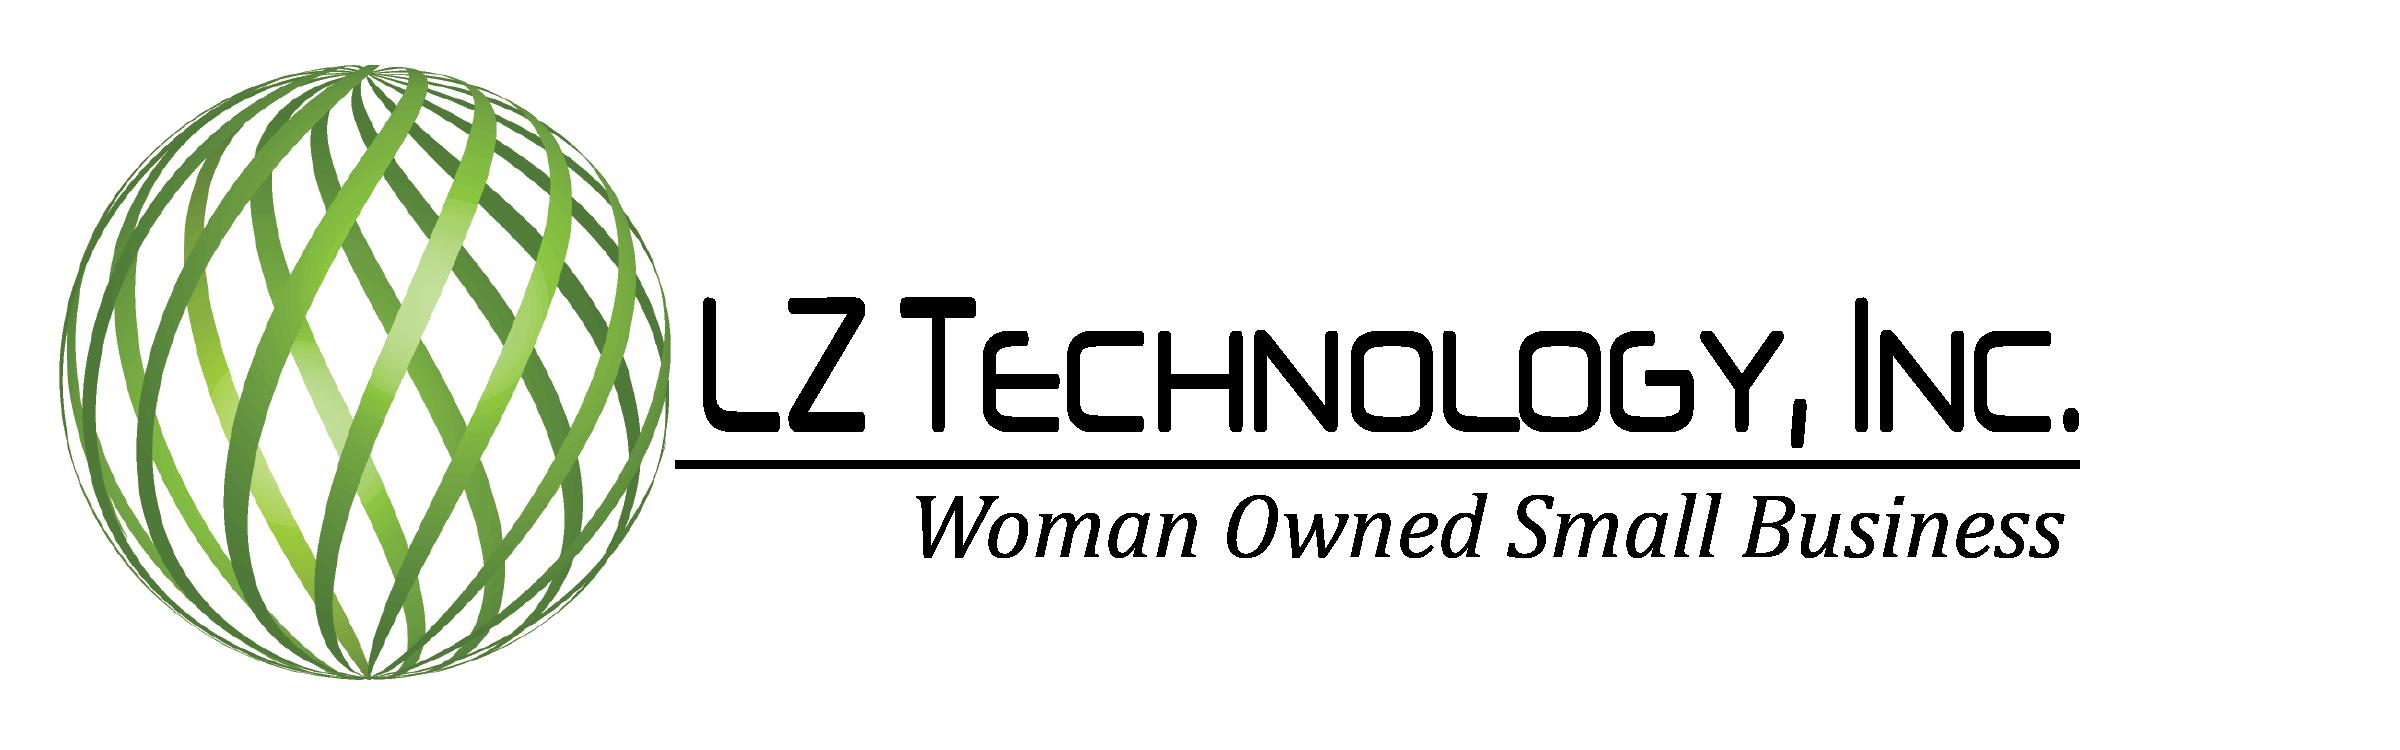 LZ Technology, Inc.